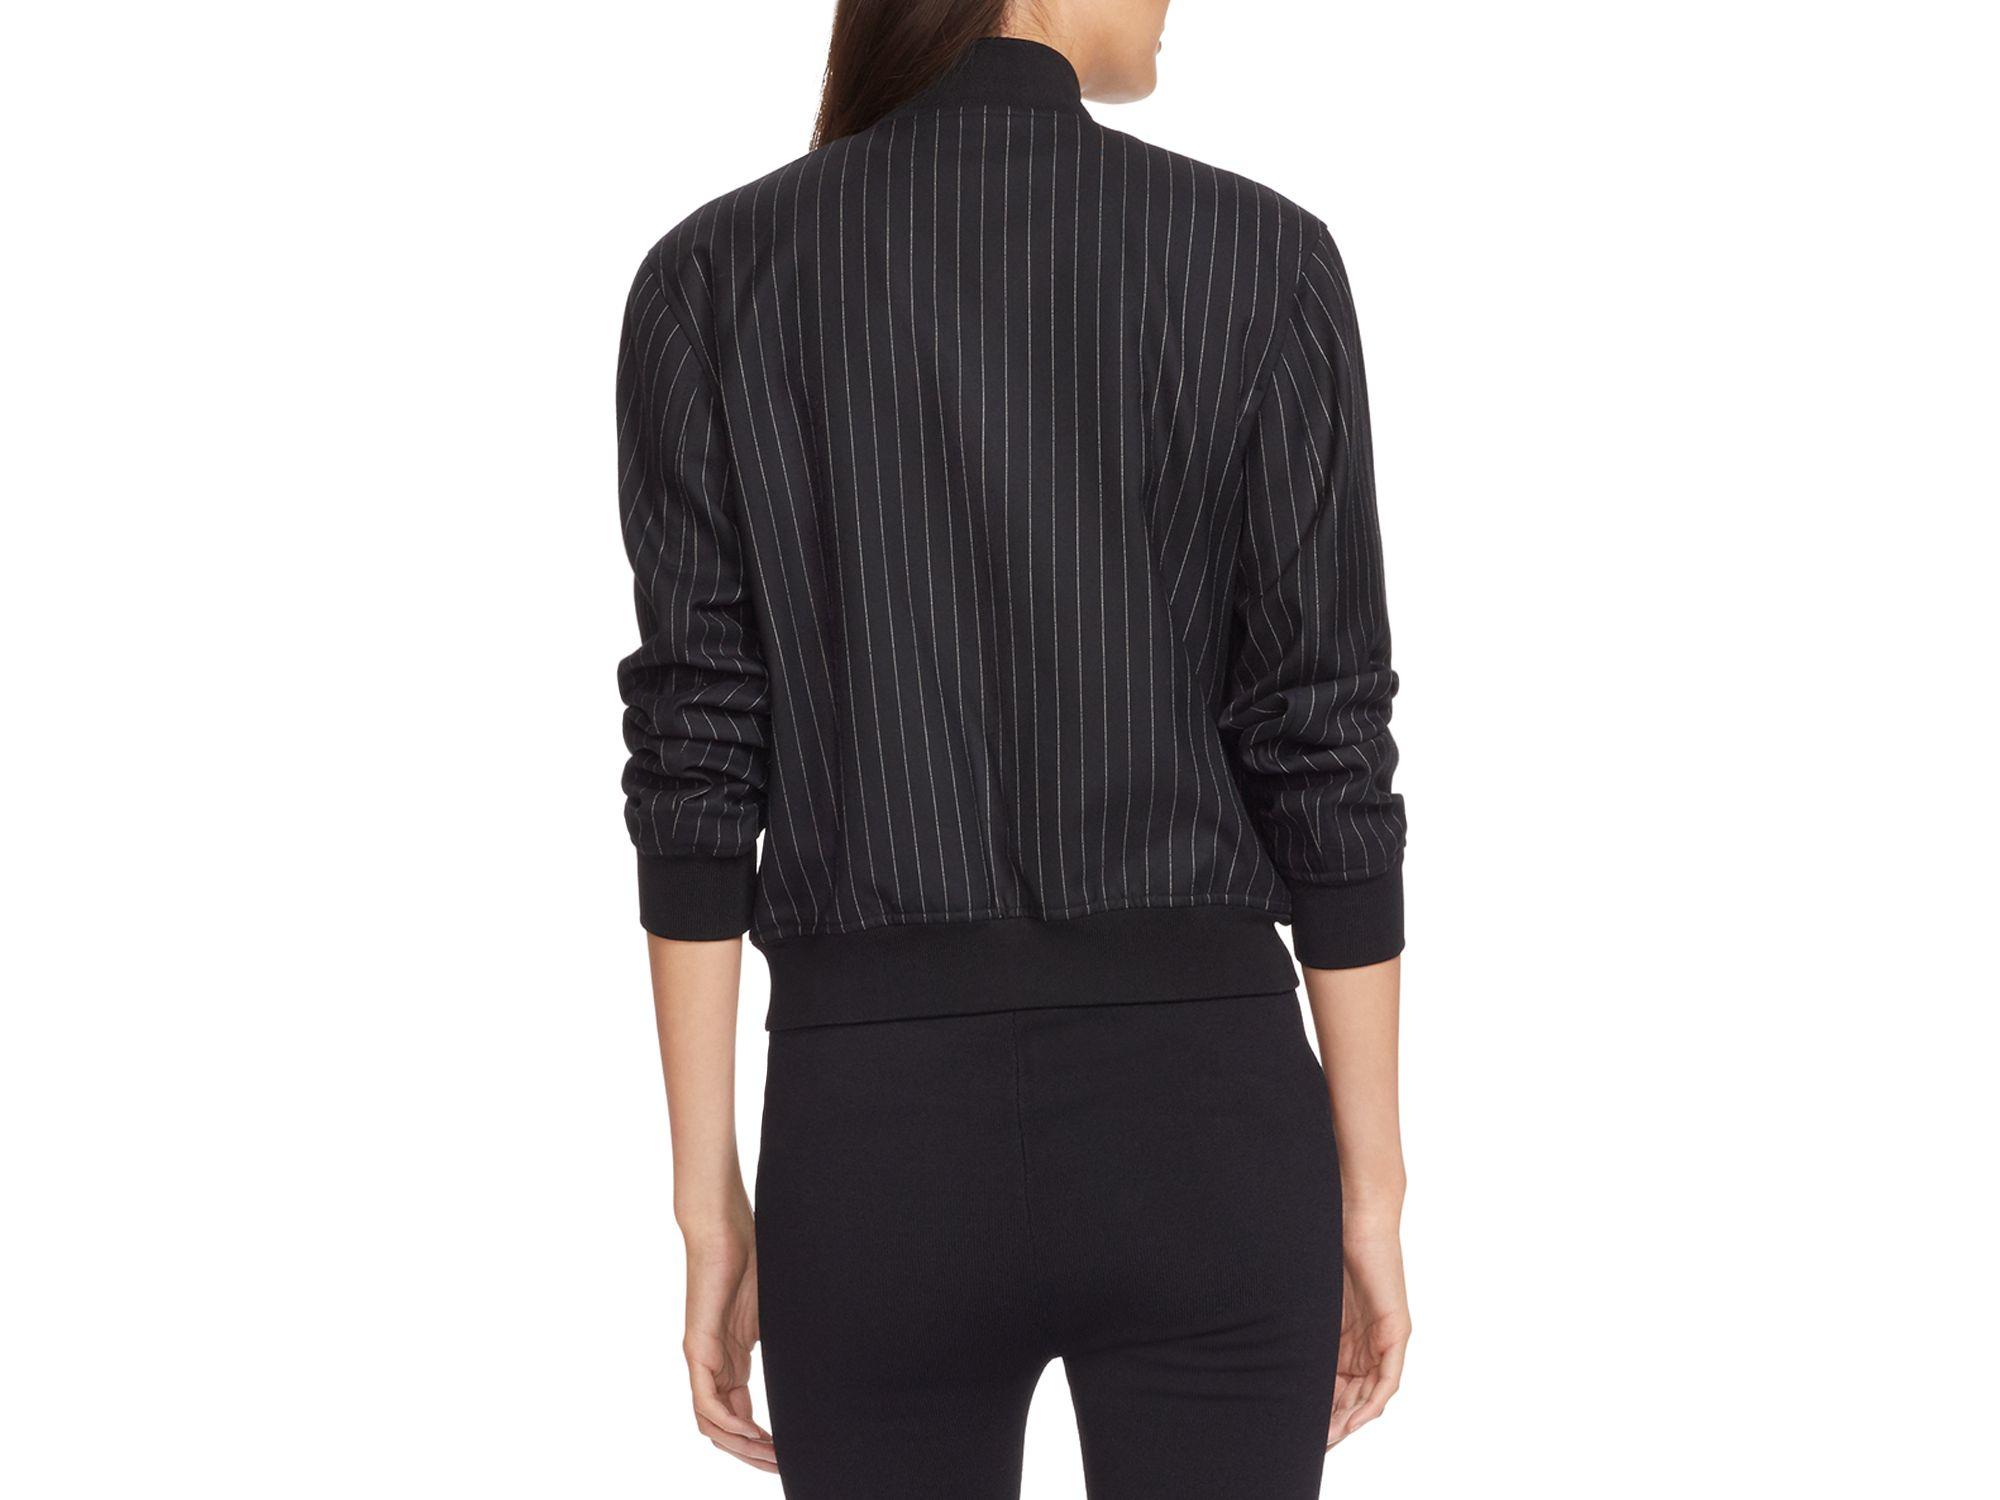 ralph lauren lauren pinstripe bomber jacket in black lyst. Black Bedroom Furniture Sets. Home Design Ideas